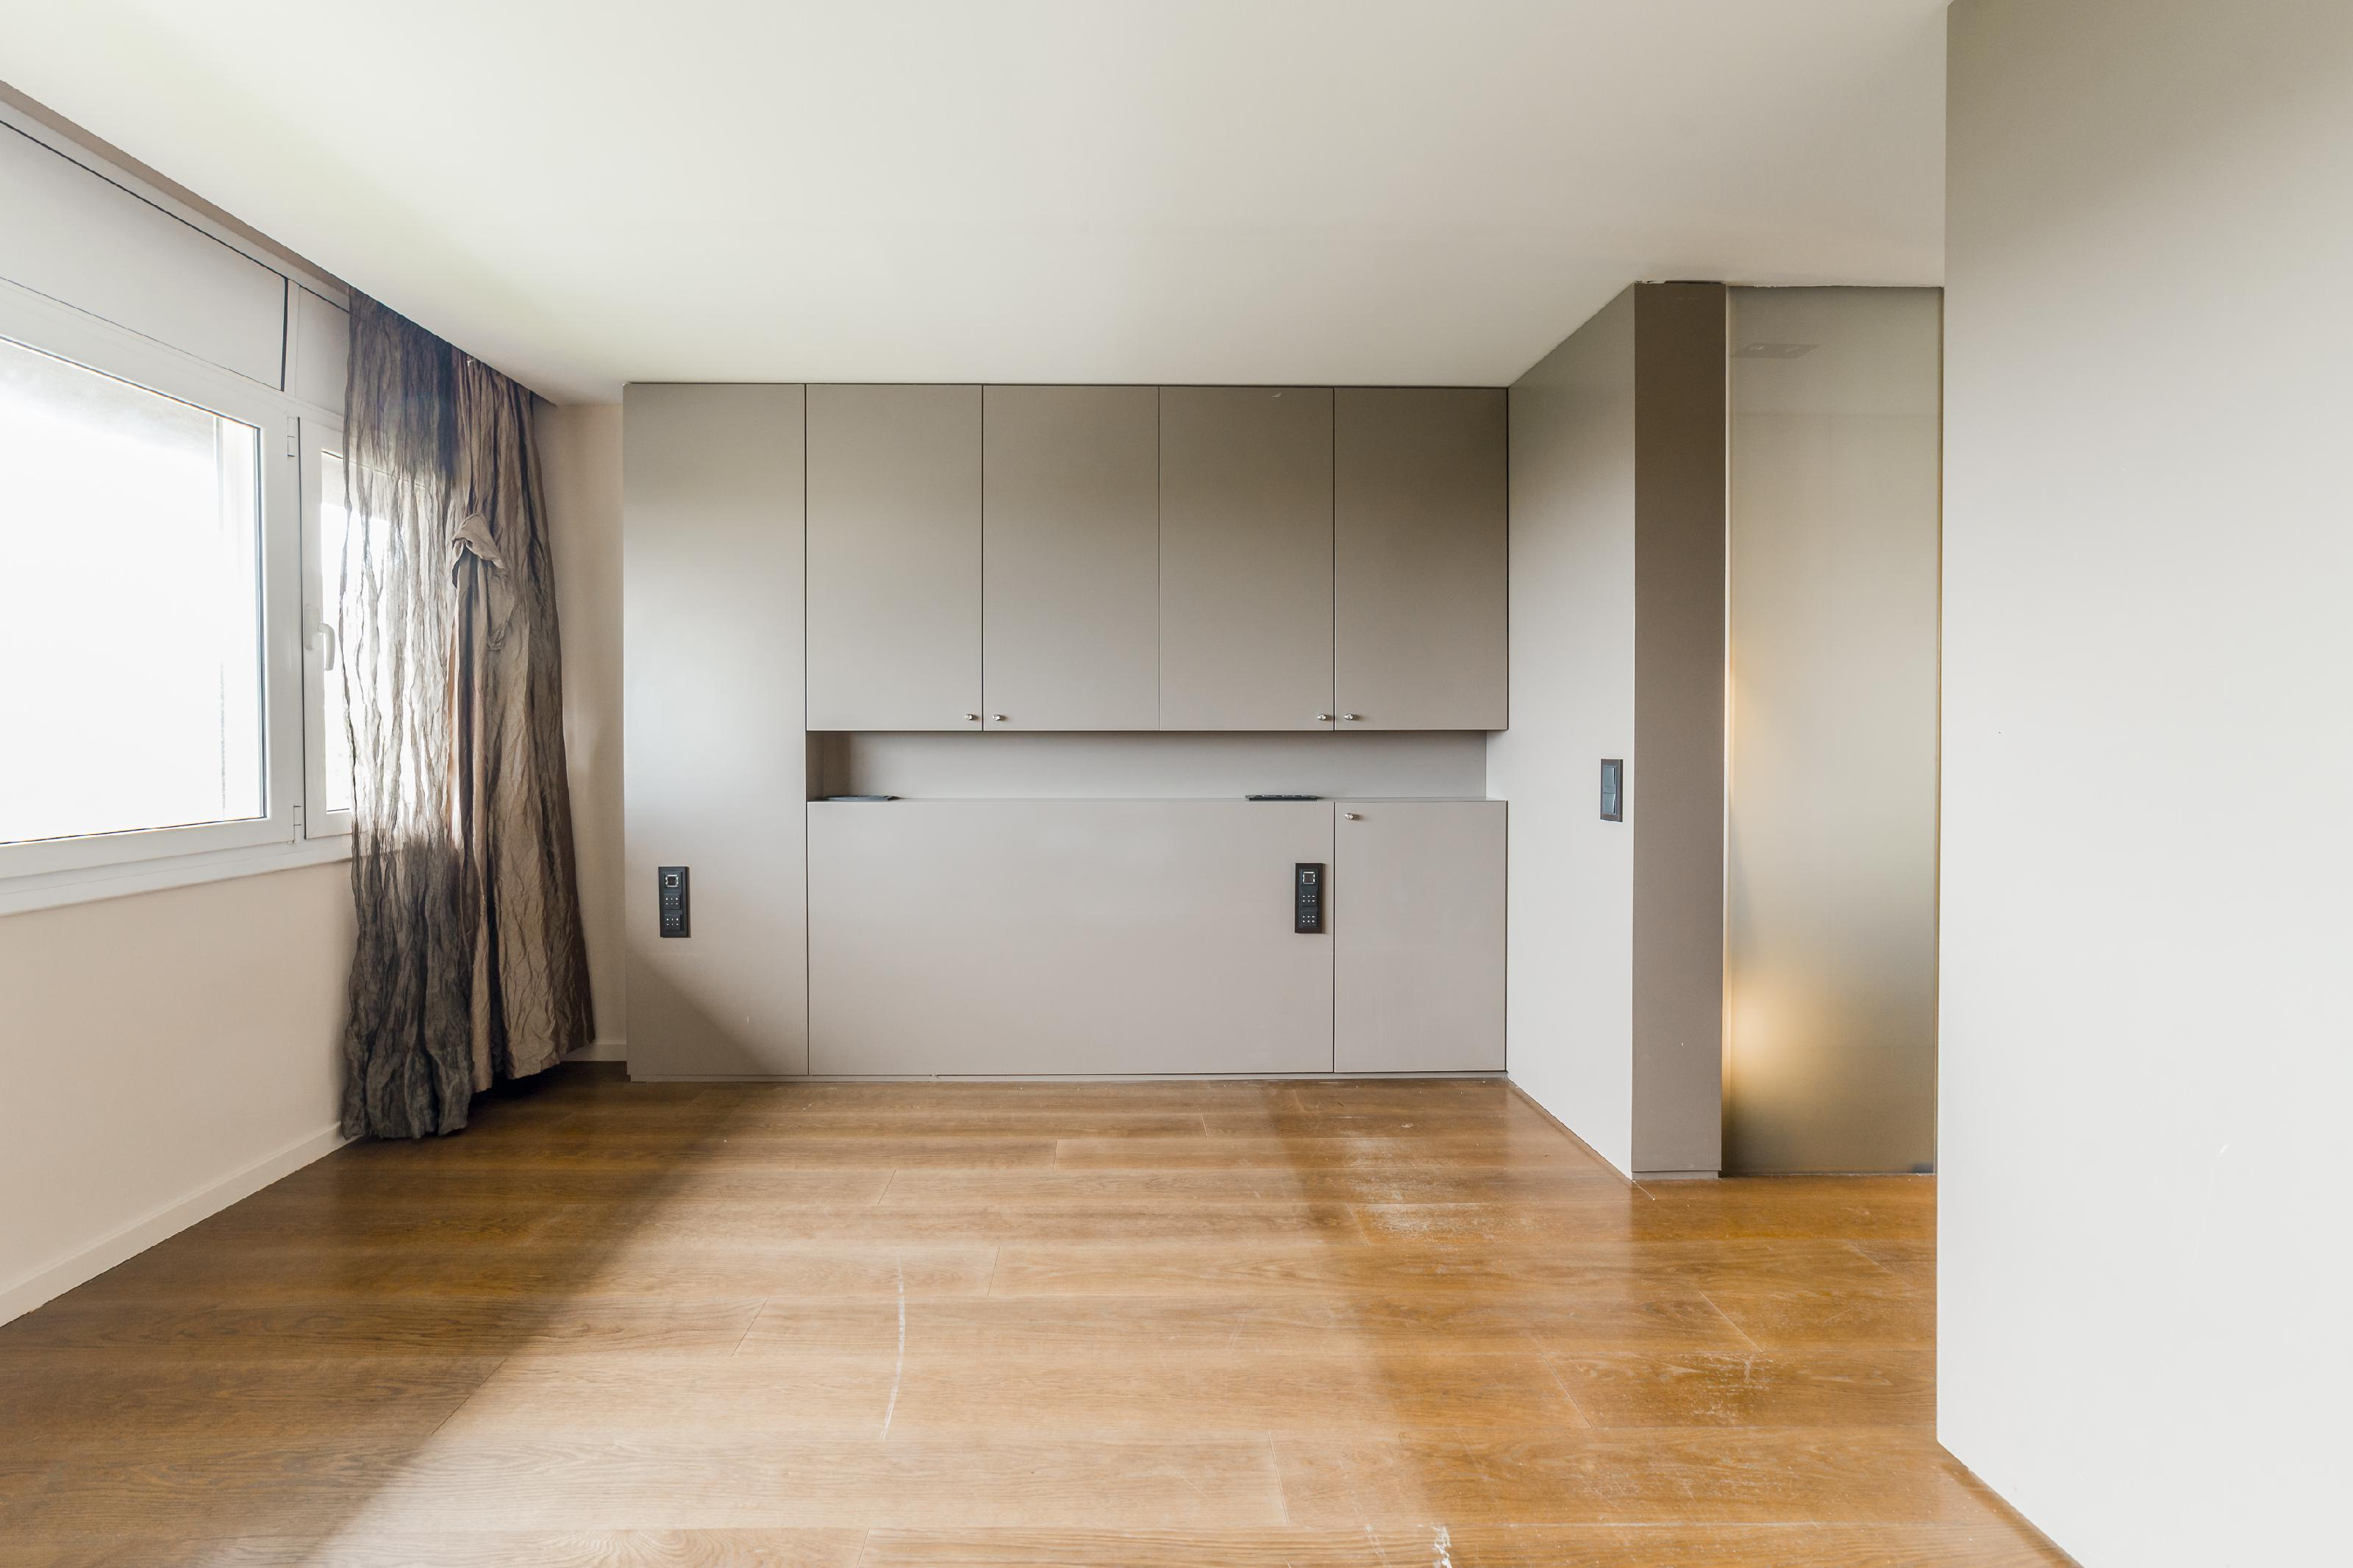 253684 Penthouse for sale in Sarrià-Sant Gervasi, Sarrià 26